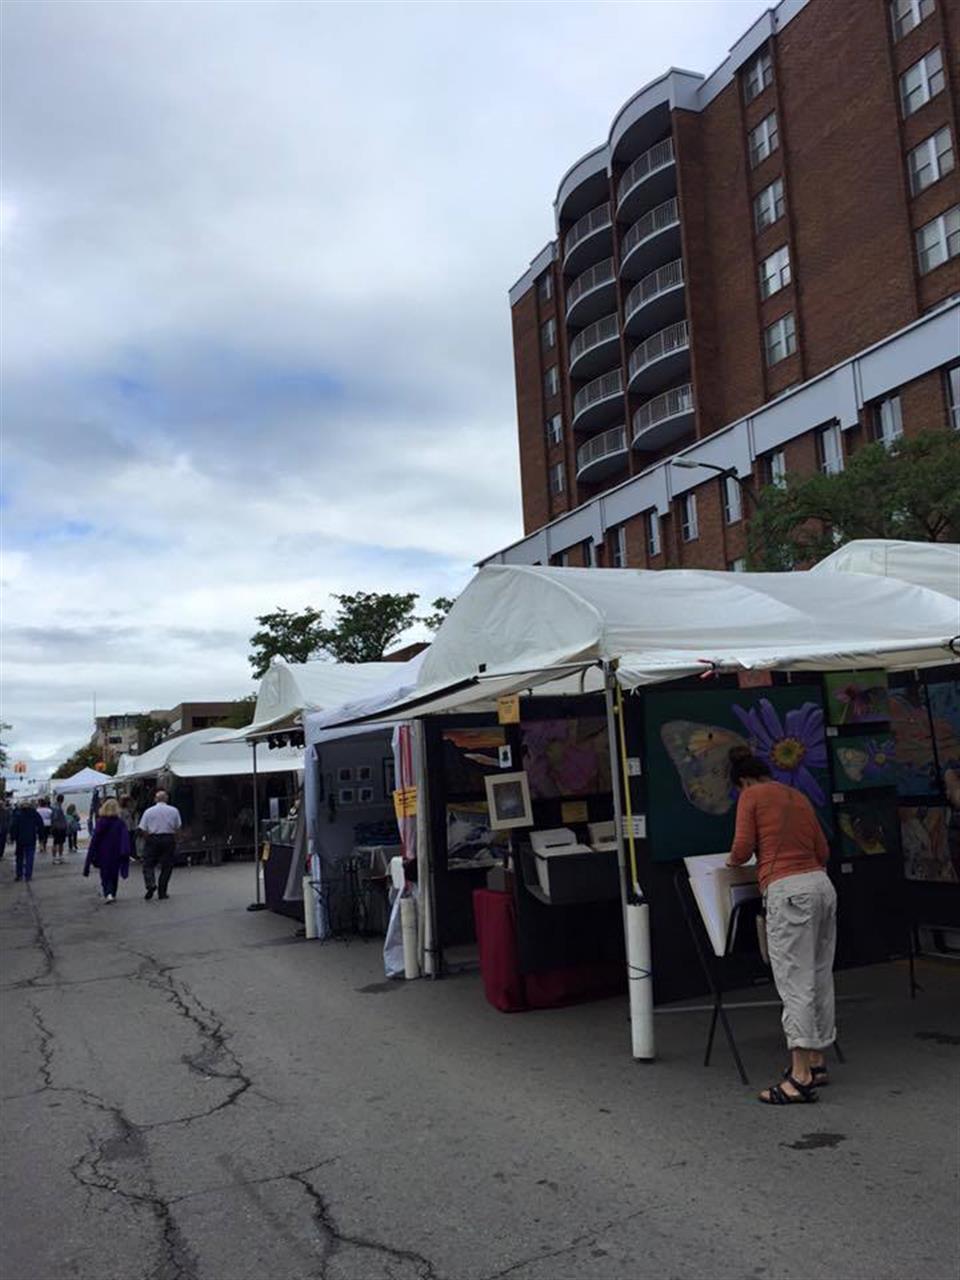 Commonground Street Art Fair lines the streets of Birmingham a weekend in September. #Birmingham #Michigan #LeadingReLocal